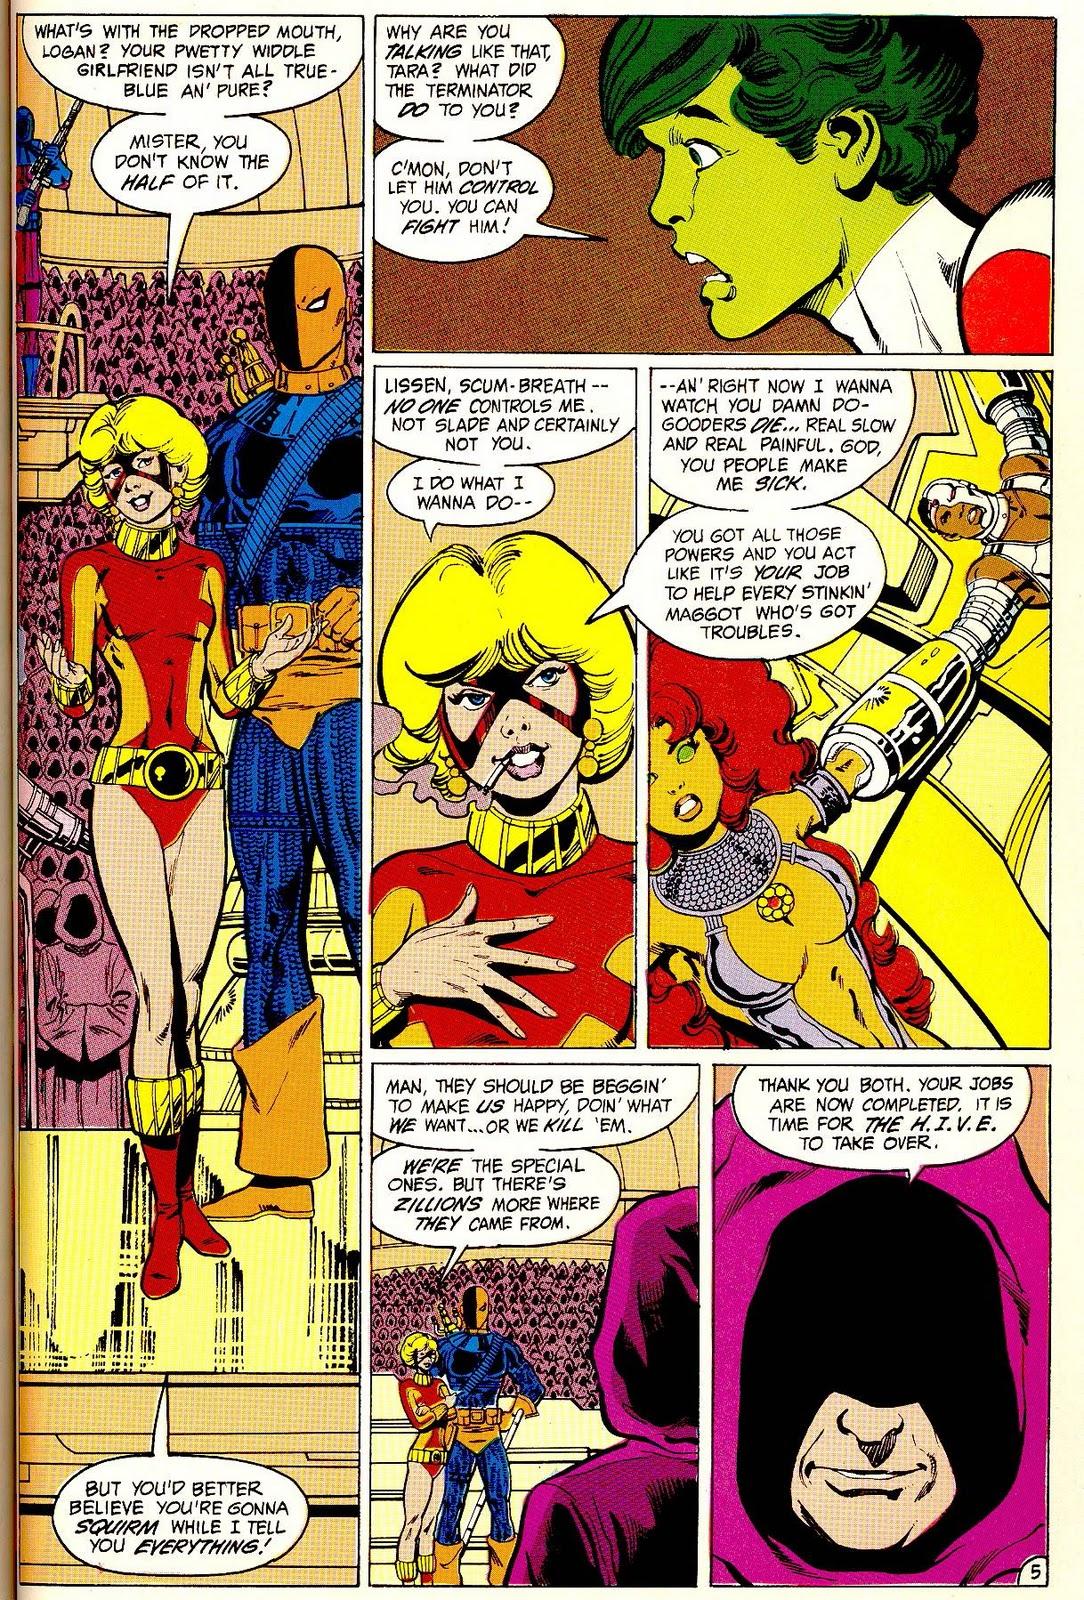 Comicbookguy37s Blog Comics Greatest Moments 2